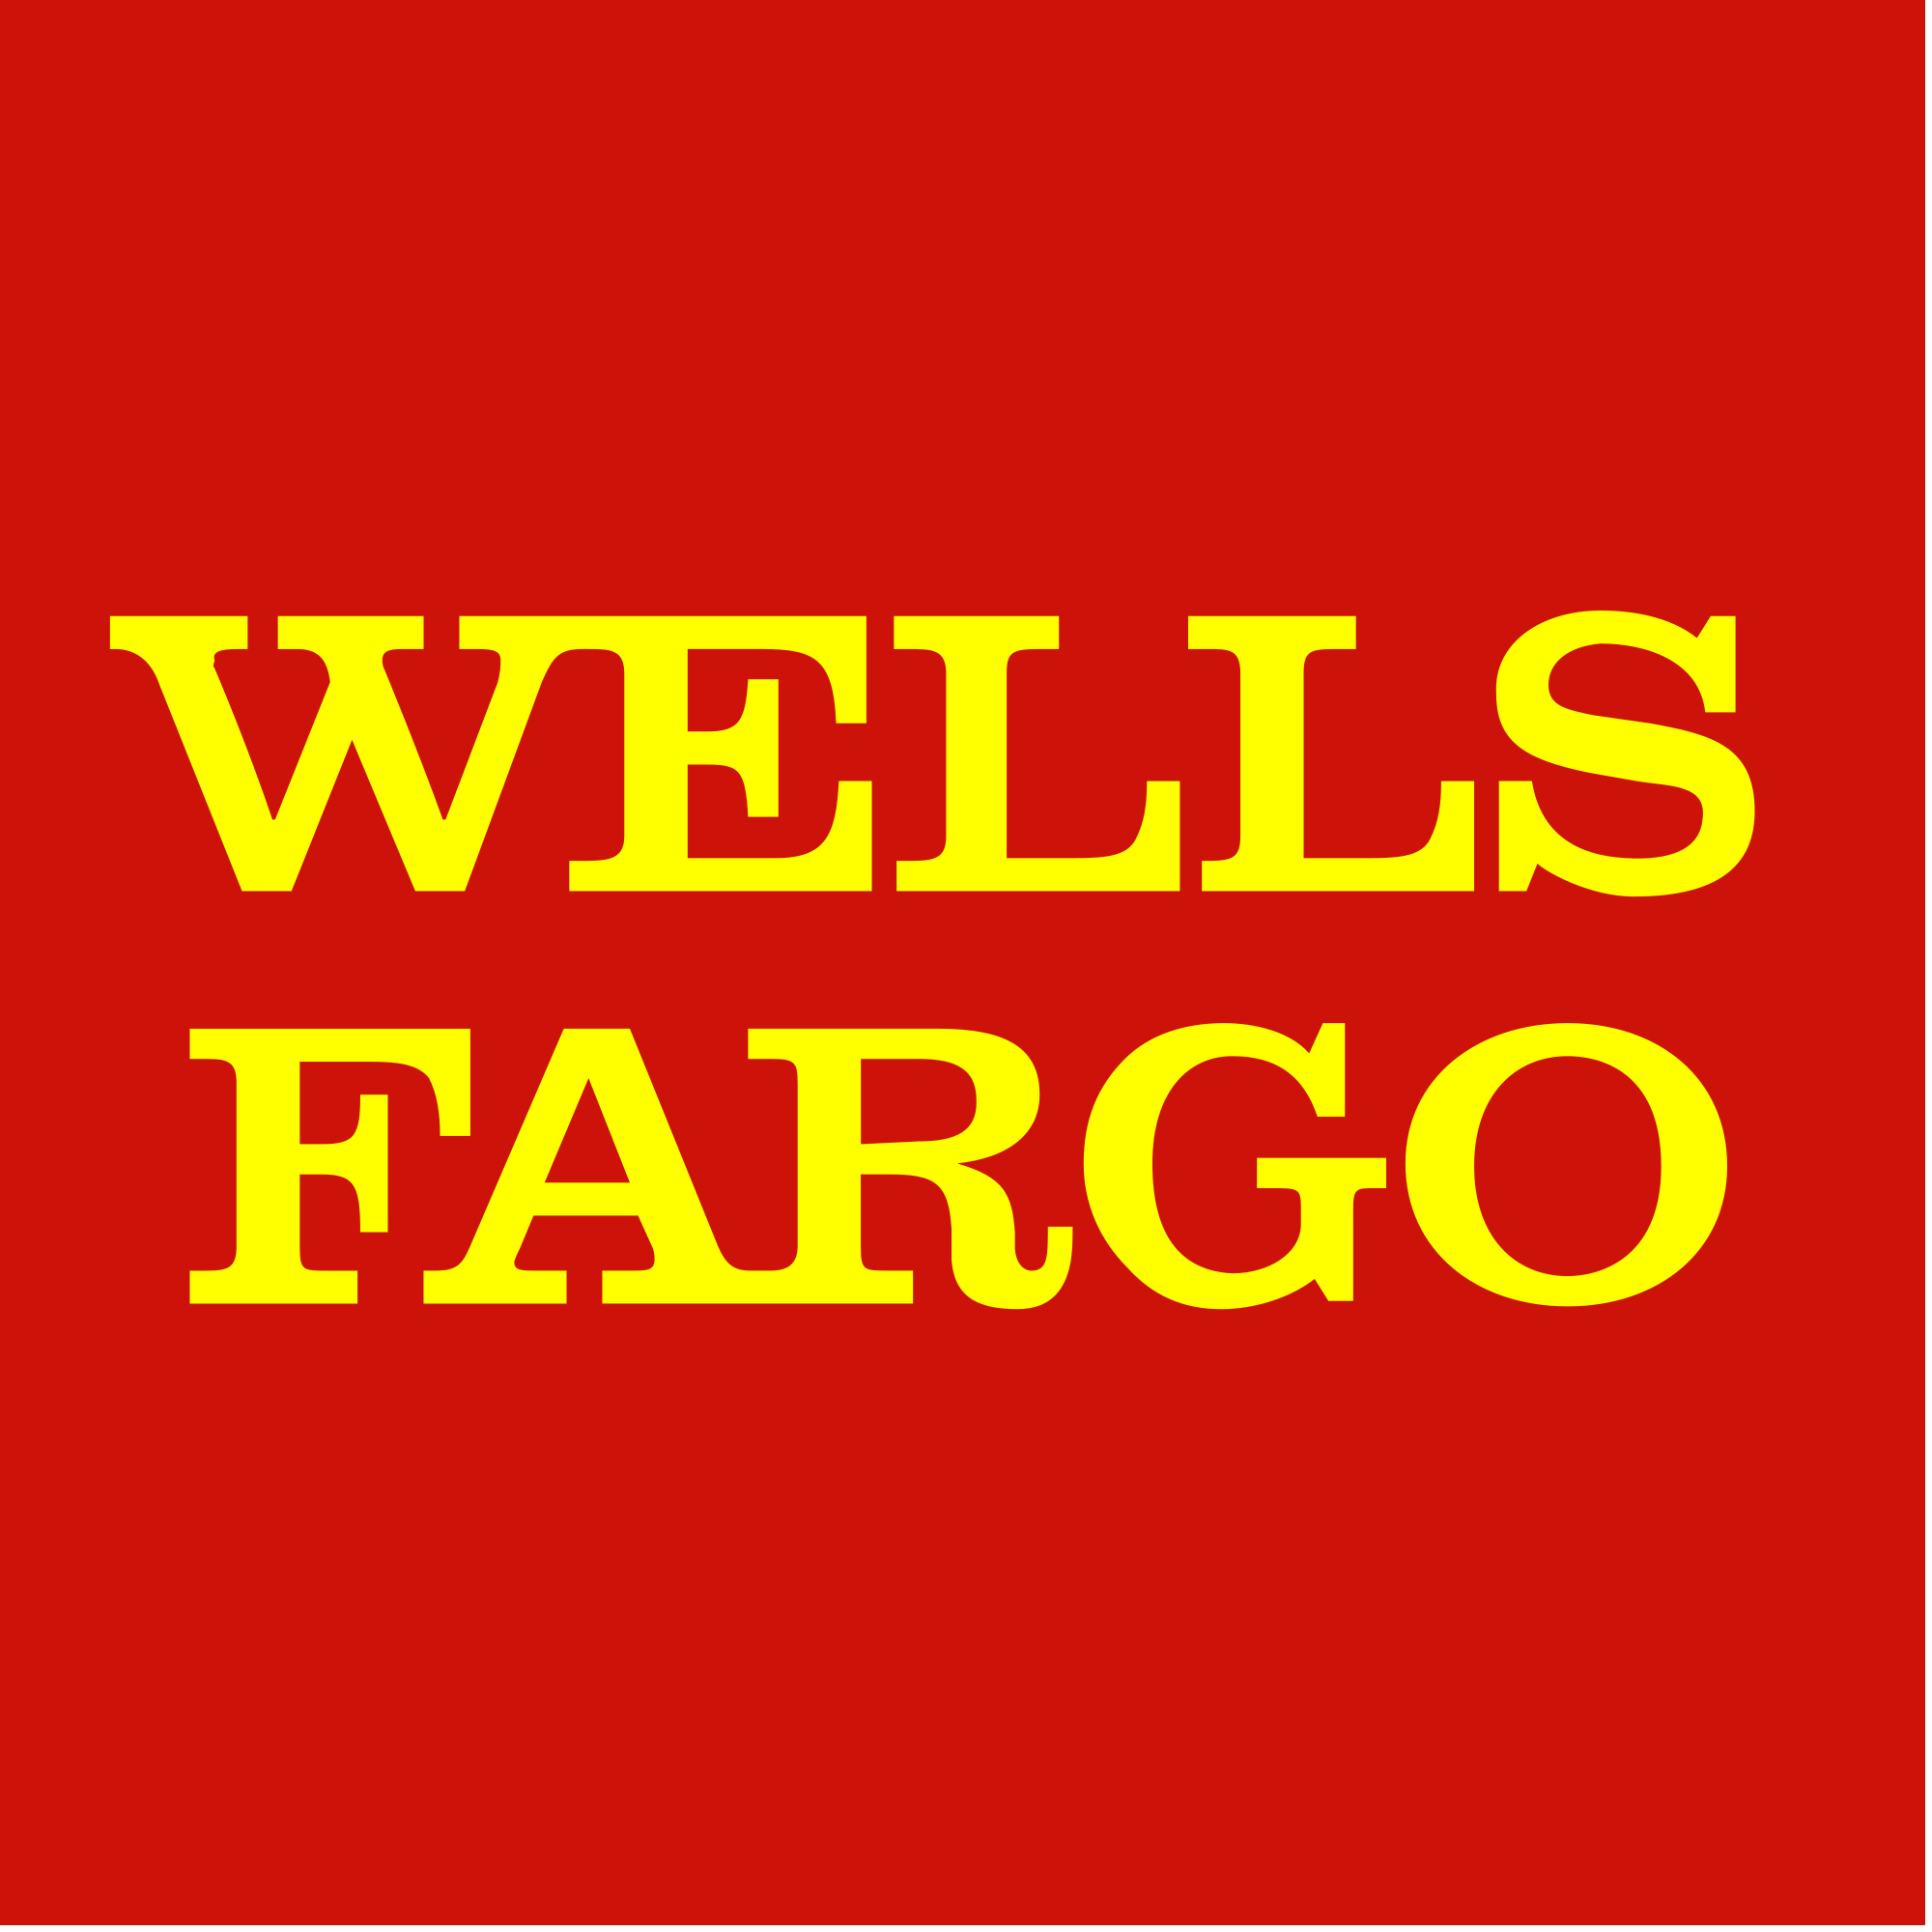 Wells Fargo Bank at Malibu Village